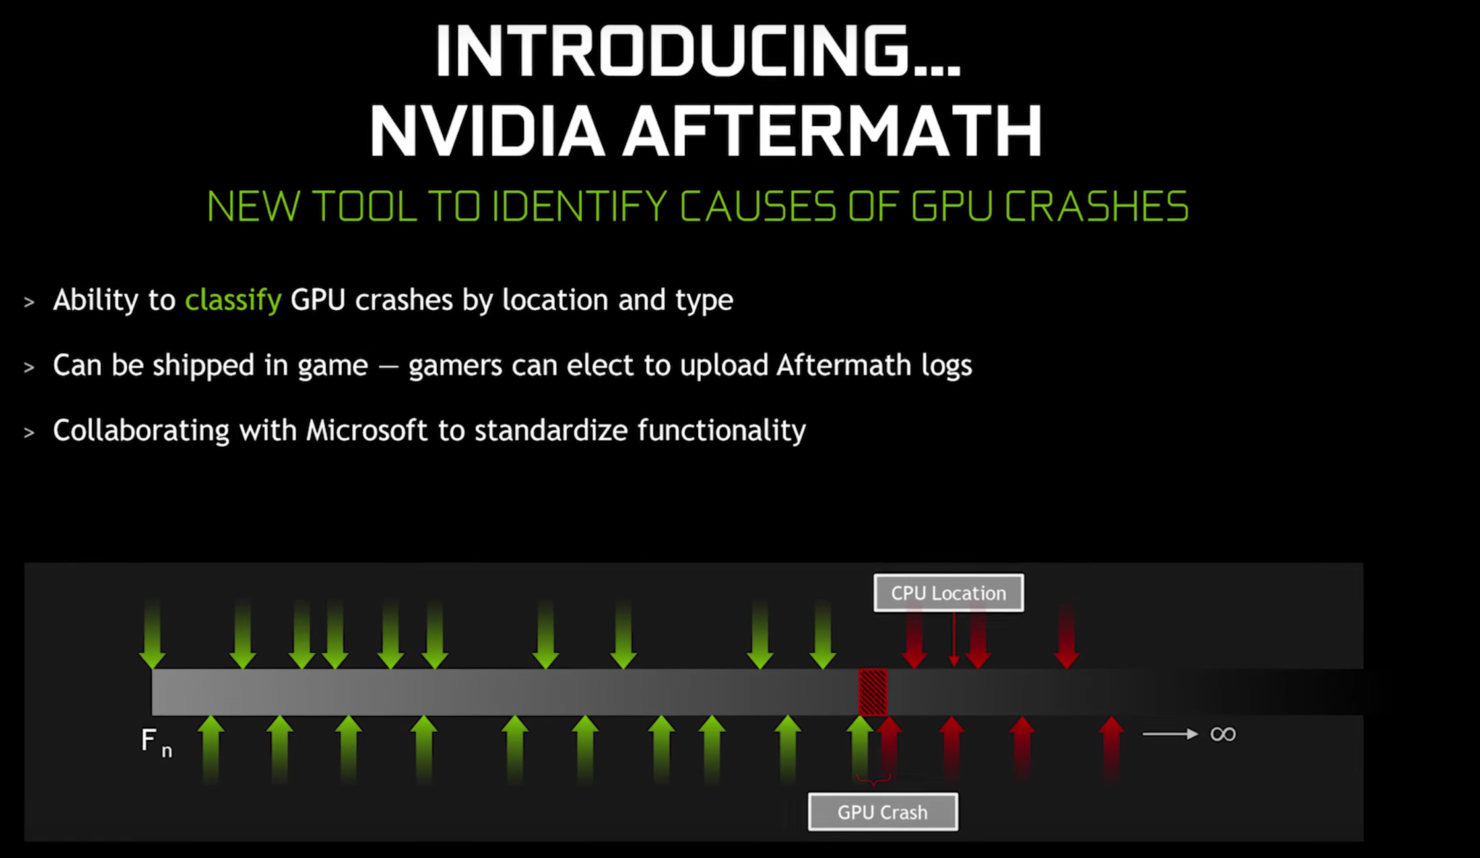 nvidia-geforce-gtx-1080-ti_aftermath